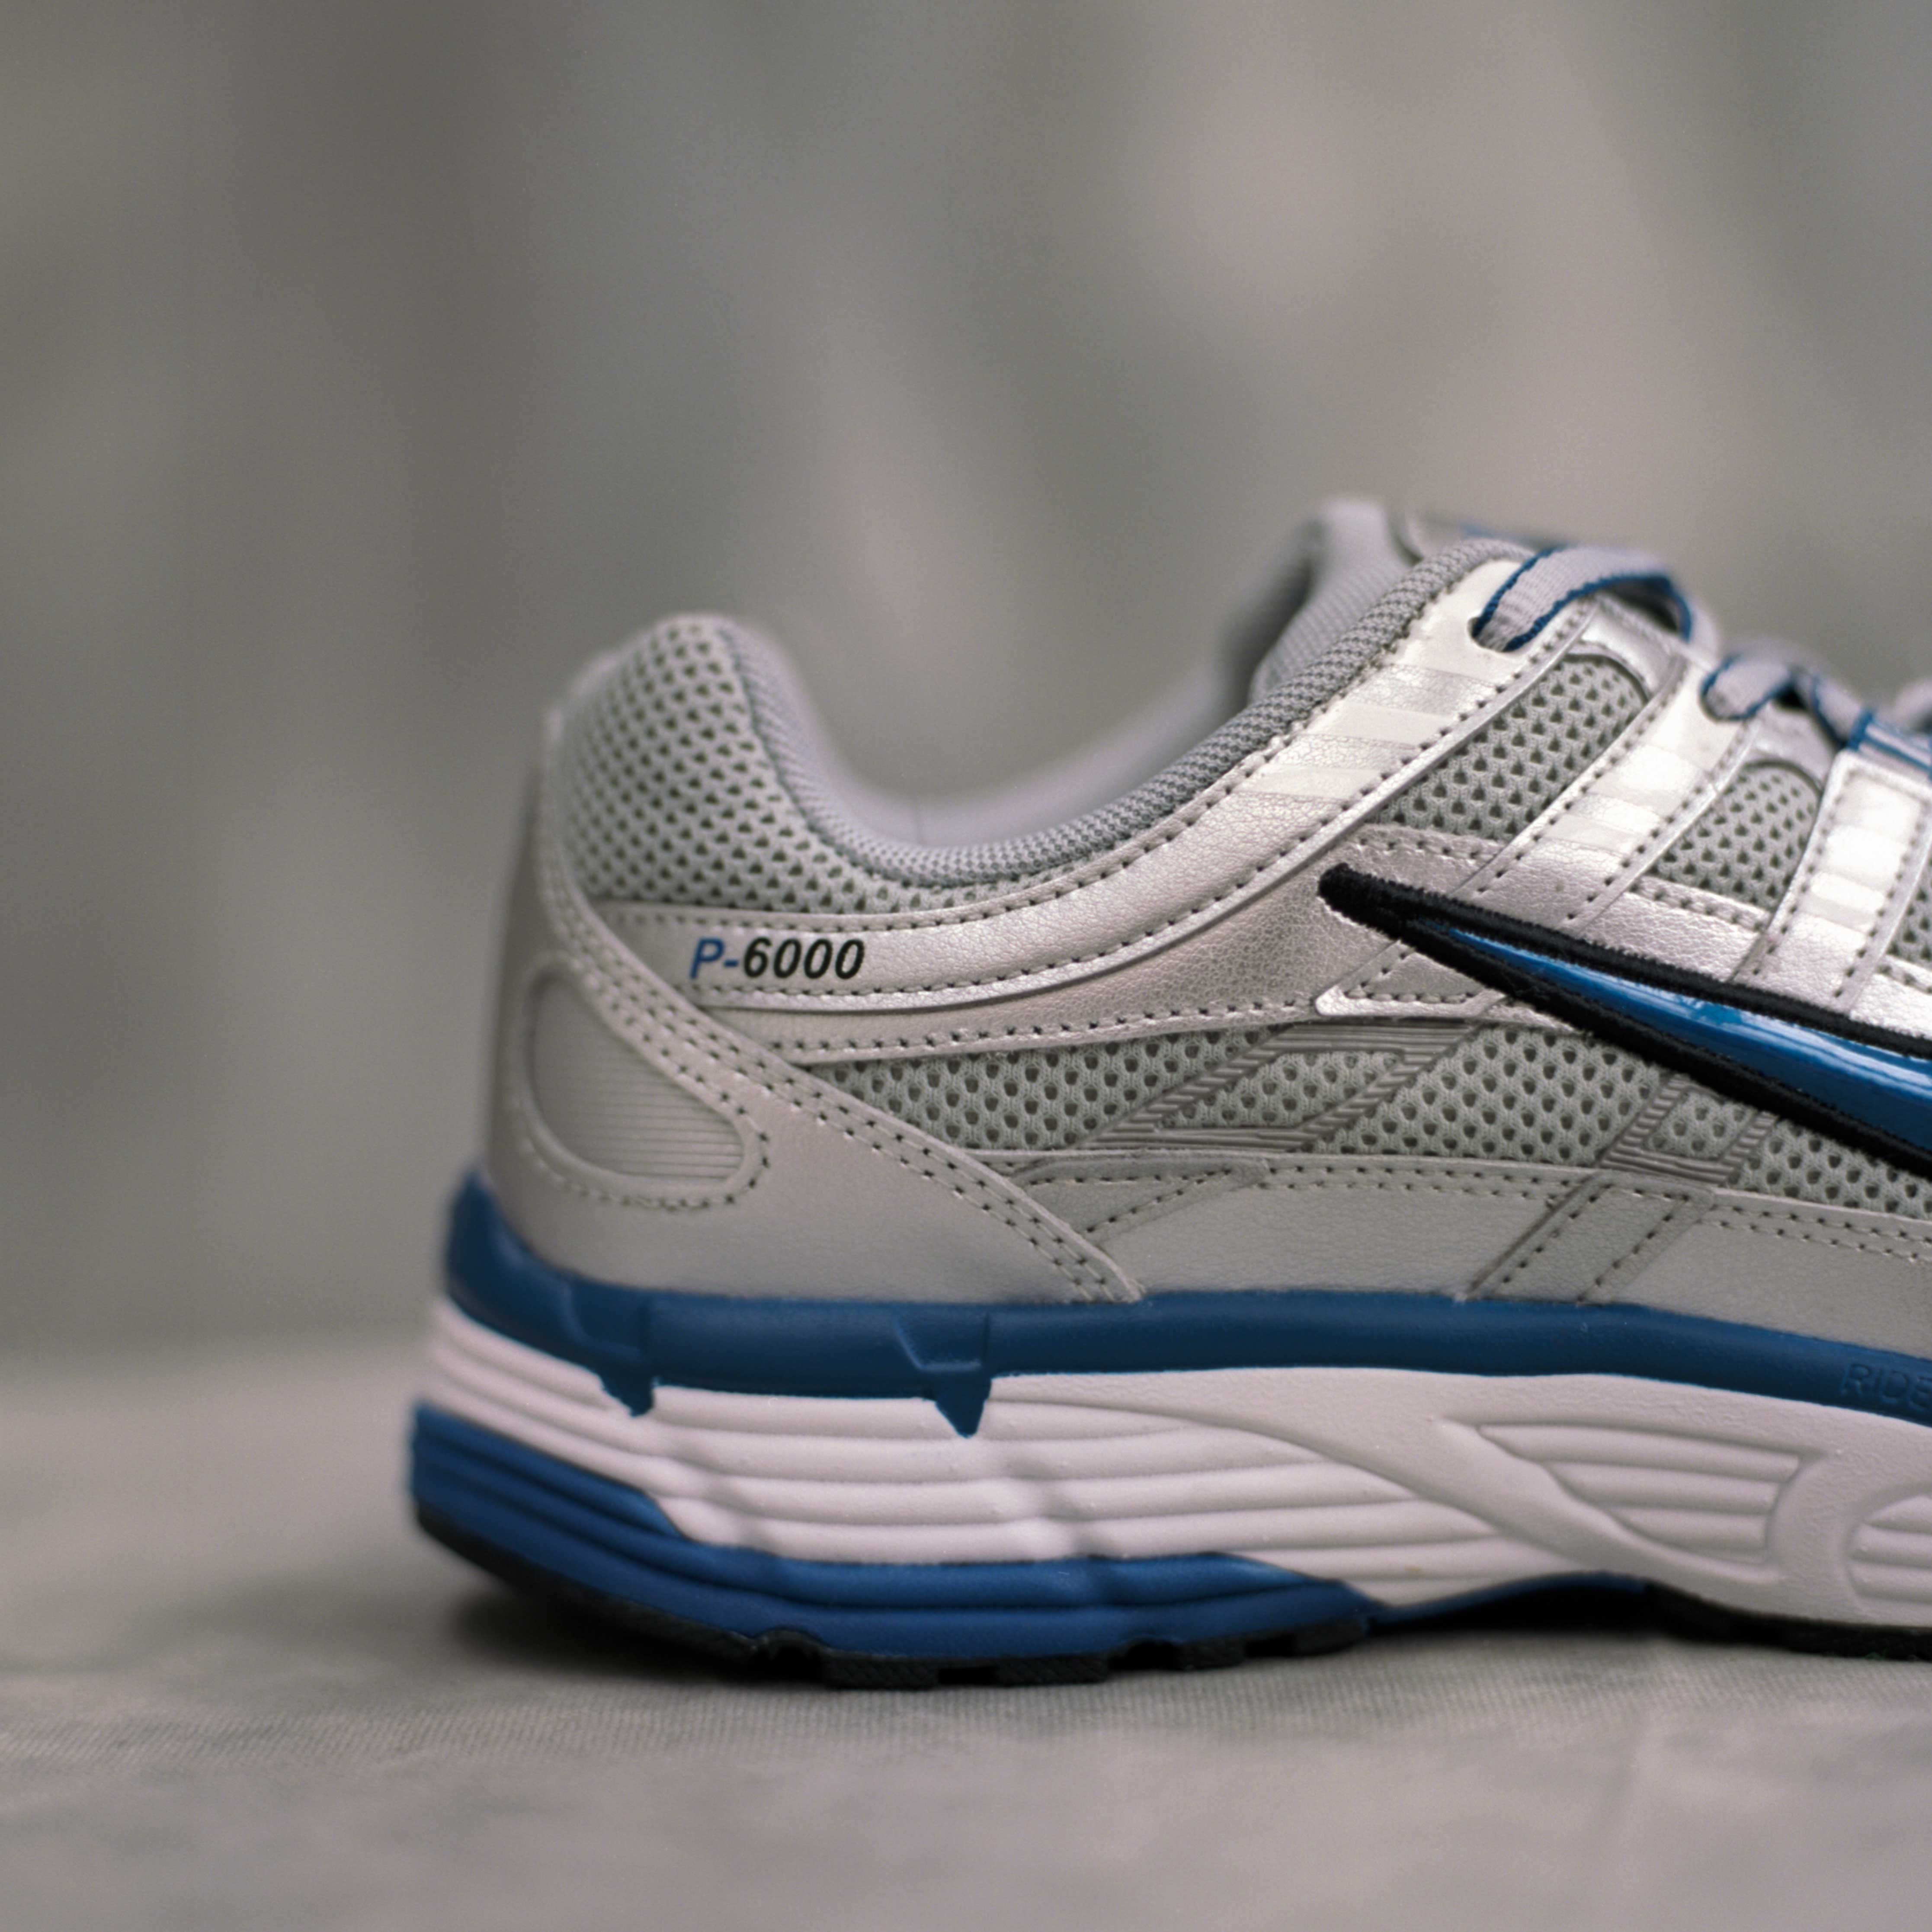 newest 2ec49 9b698 Nike Sportswear Wmns P-6000 - 10. Close